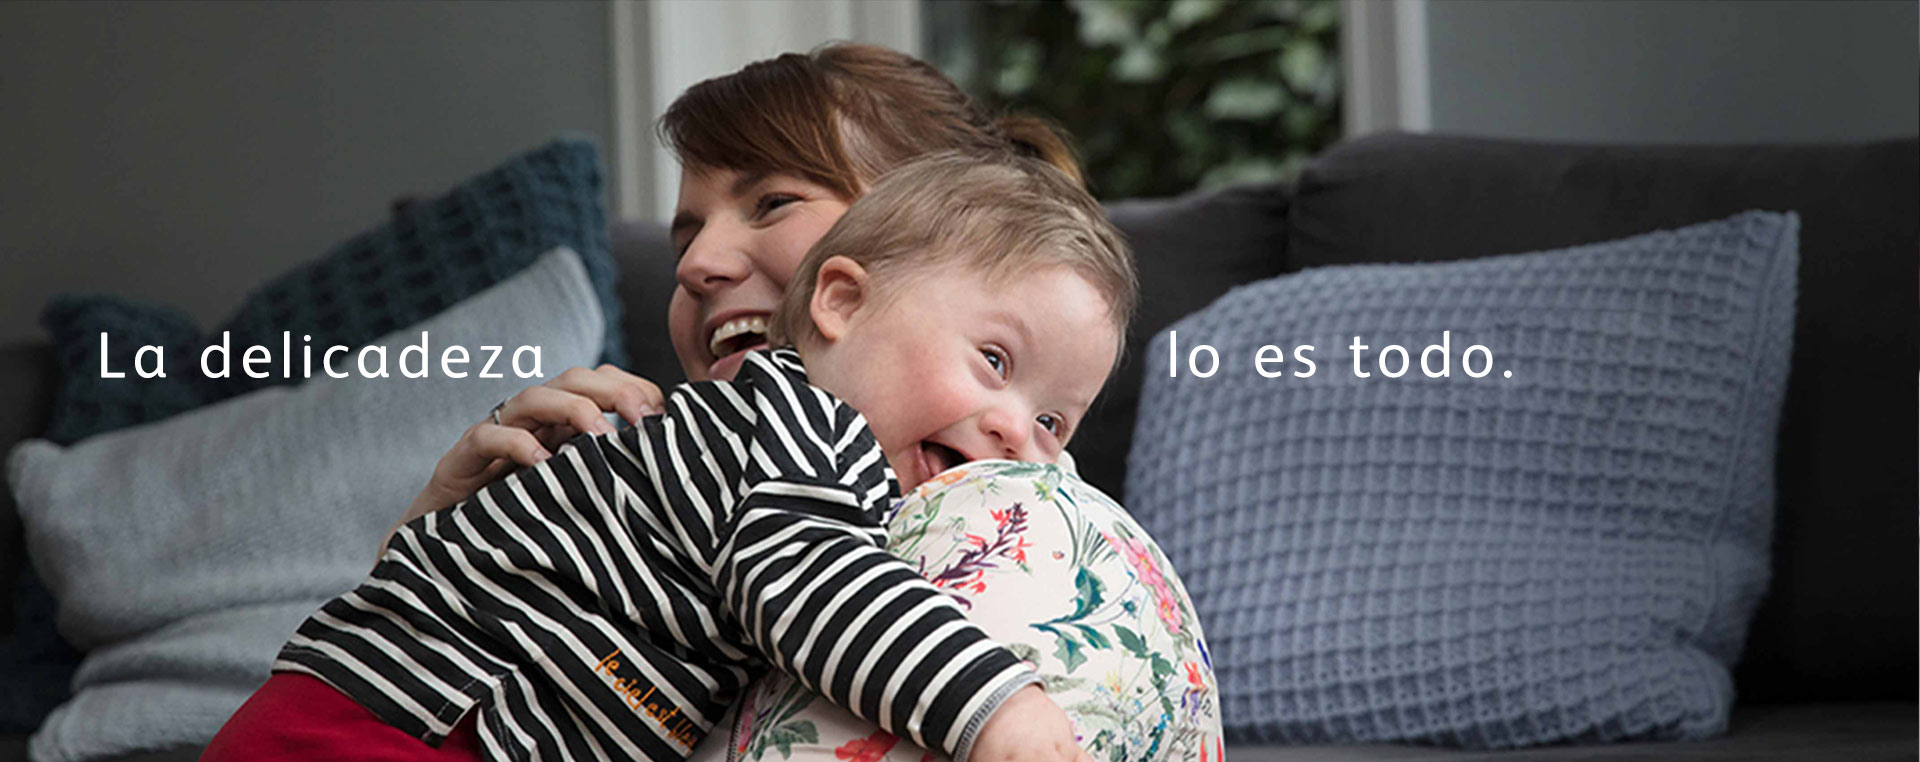 madre abrazando a bebé sonriente